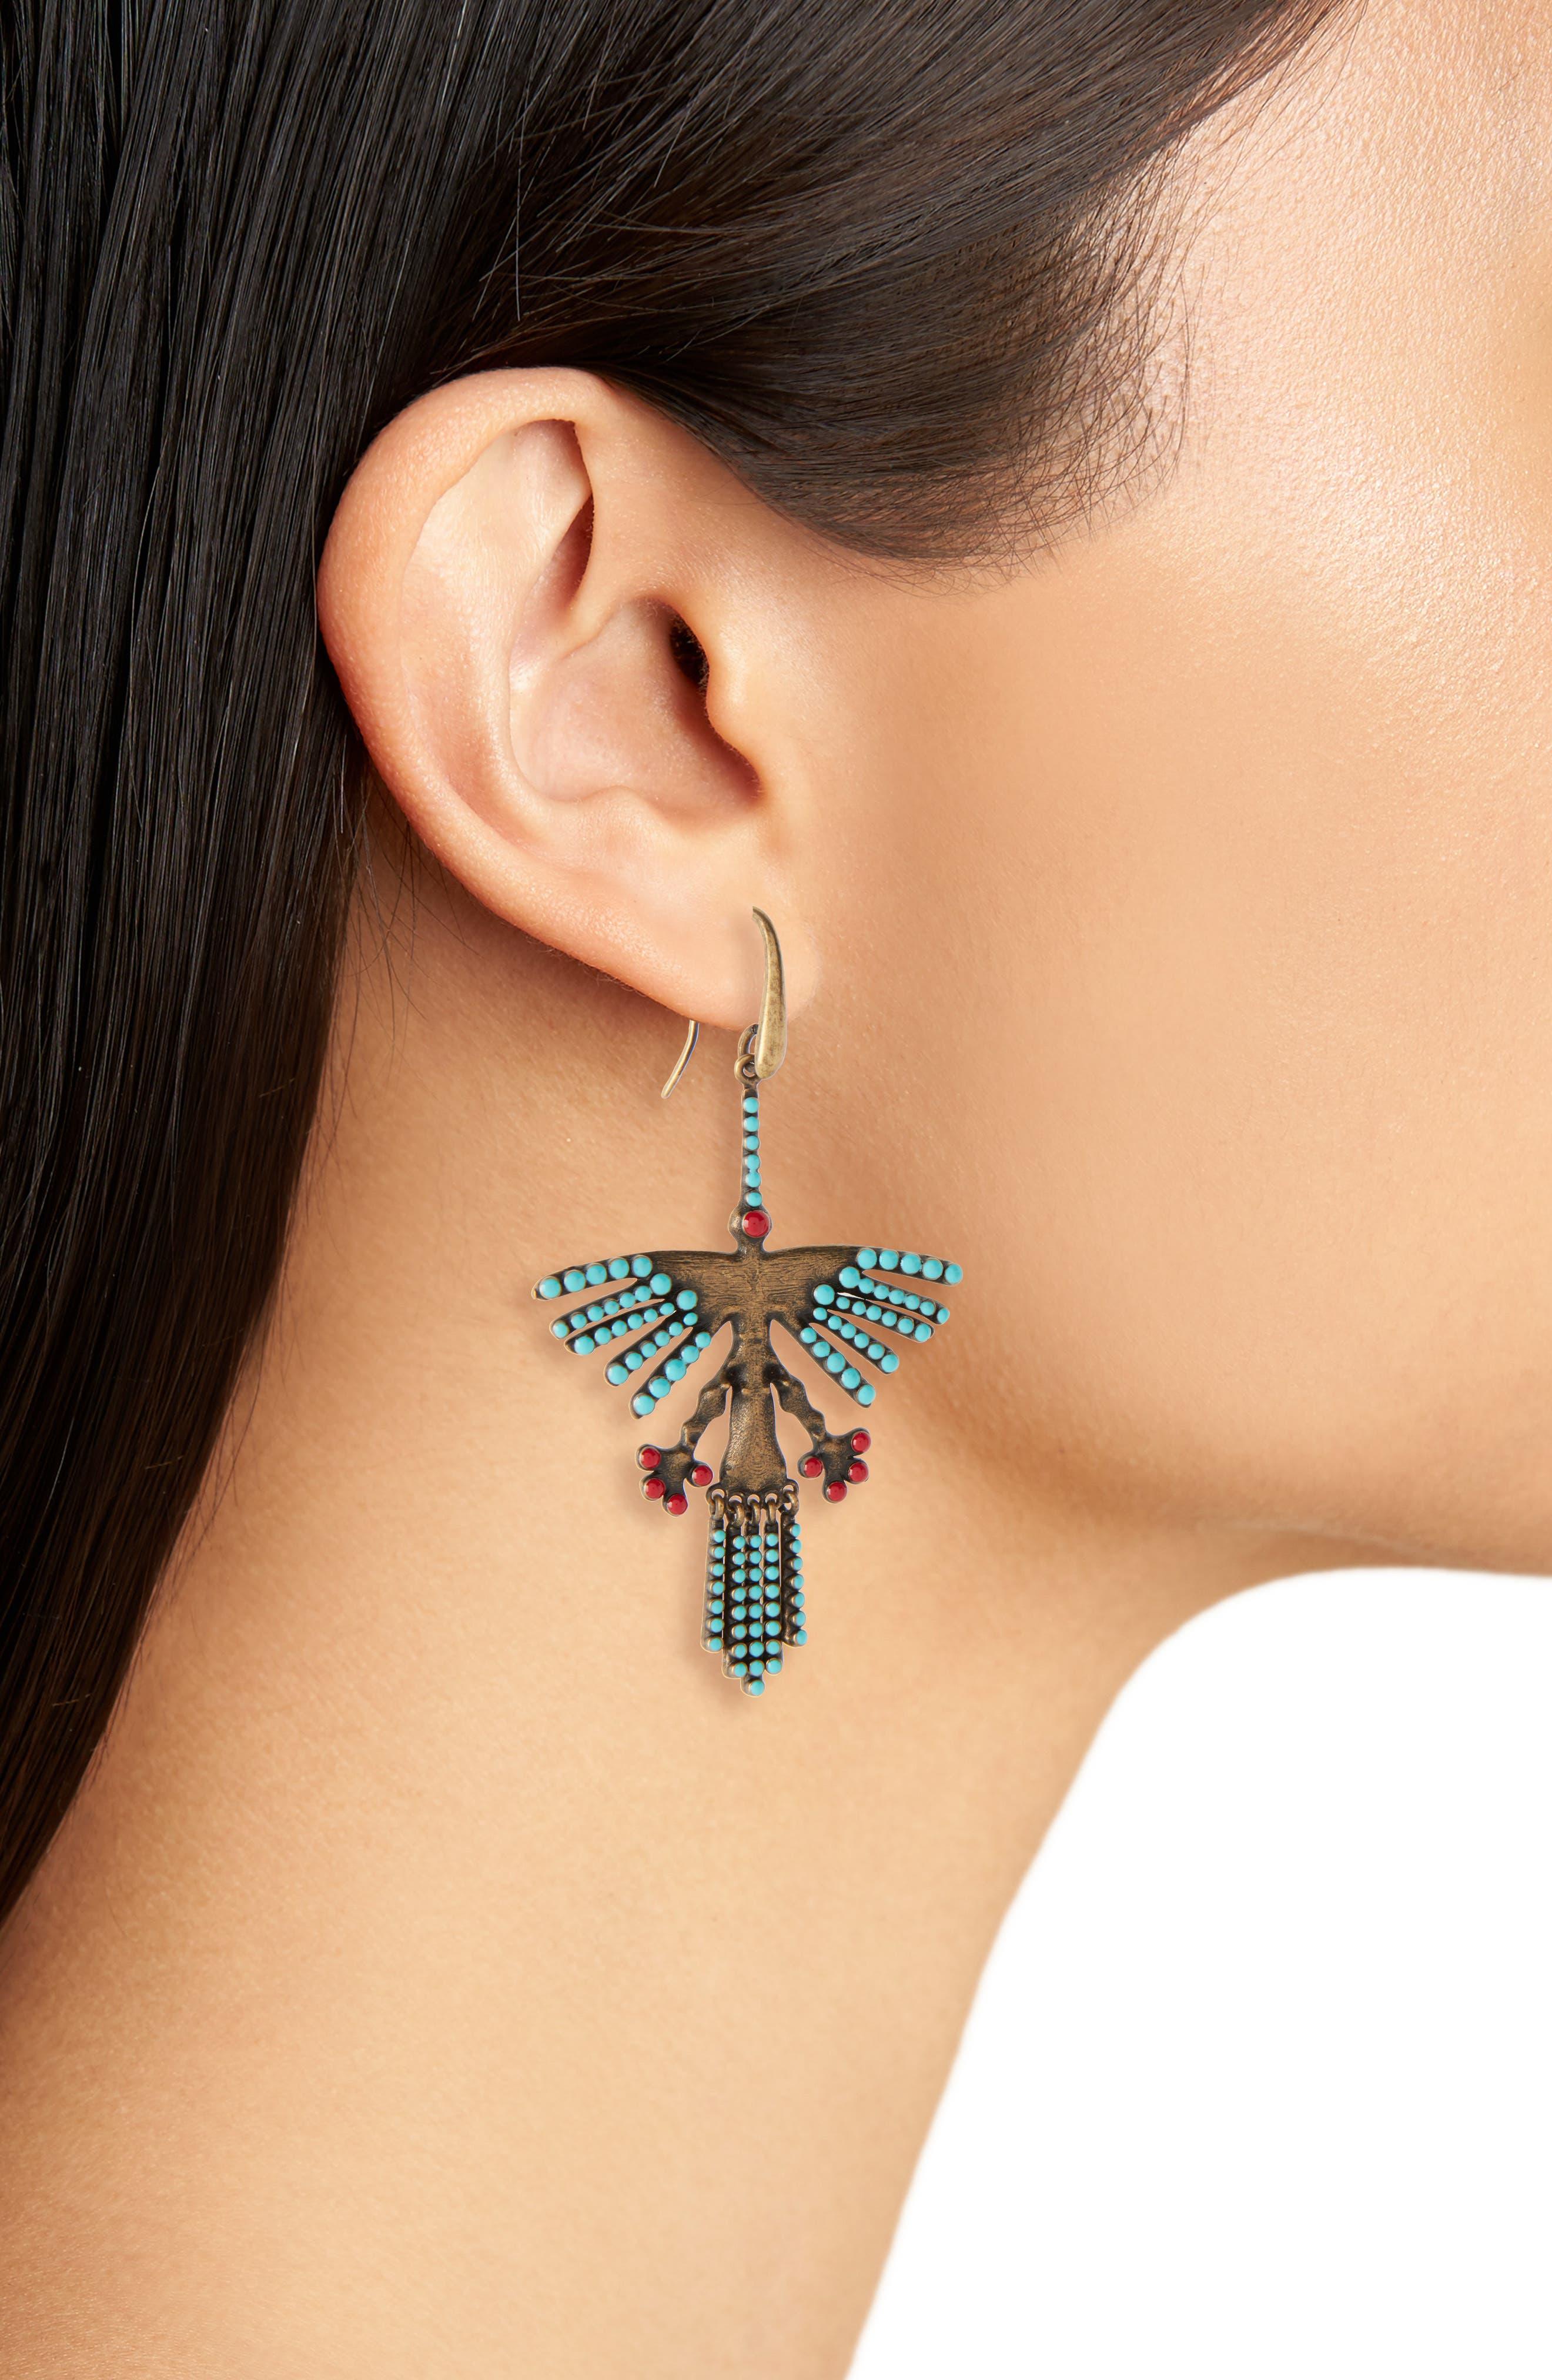 Hummingbird Earrings,                             Alternate thumbnail 2, color,                             Antique Silver/ Ematite/ Ivory